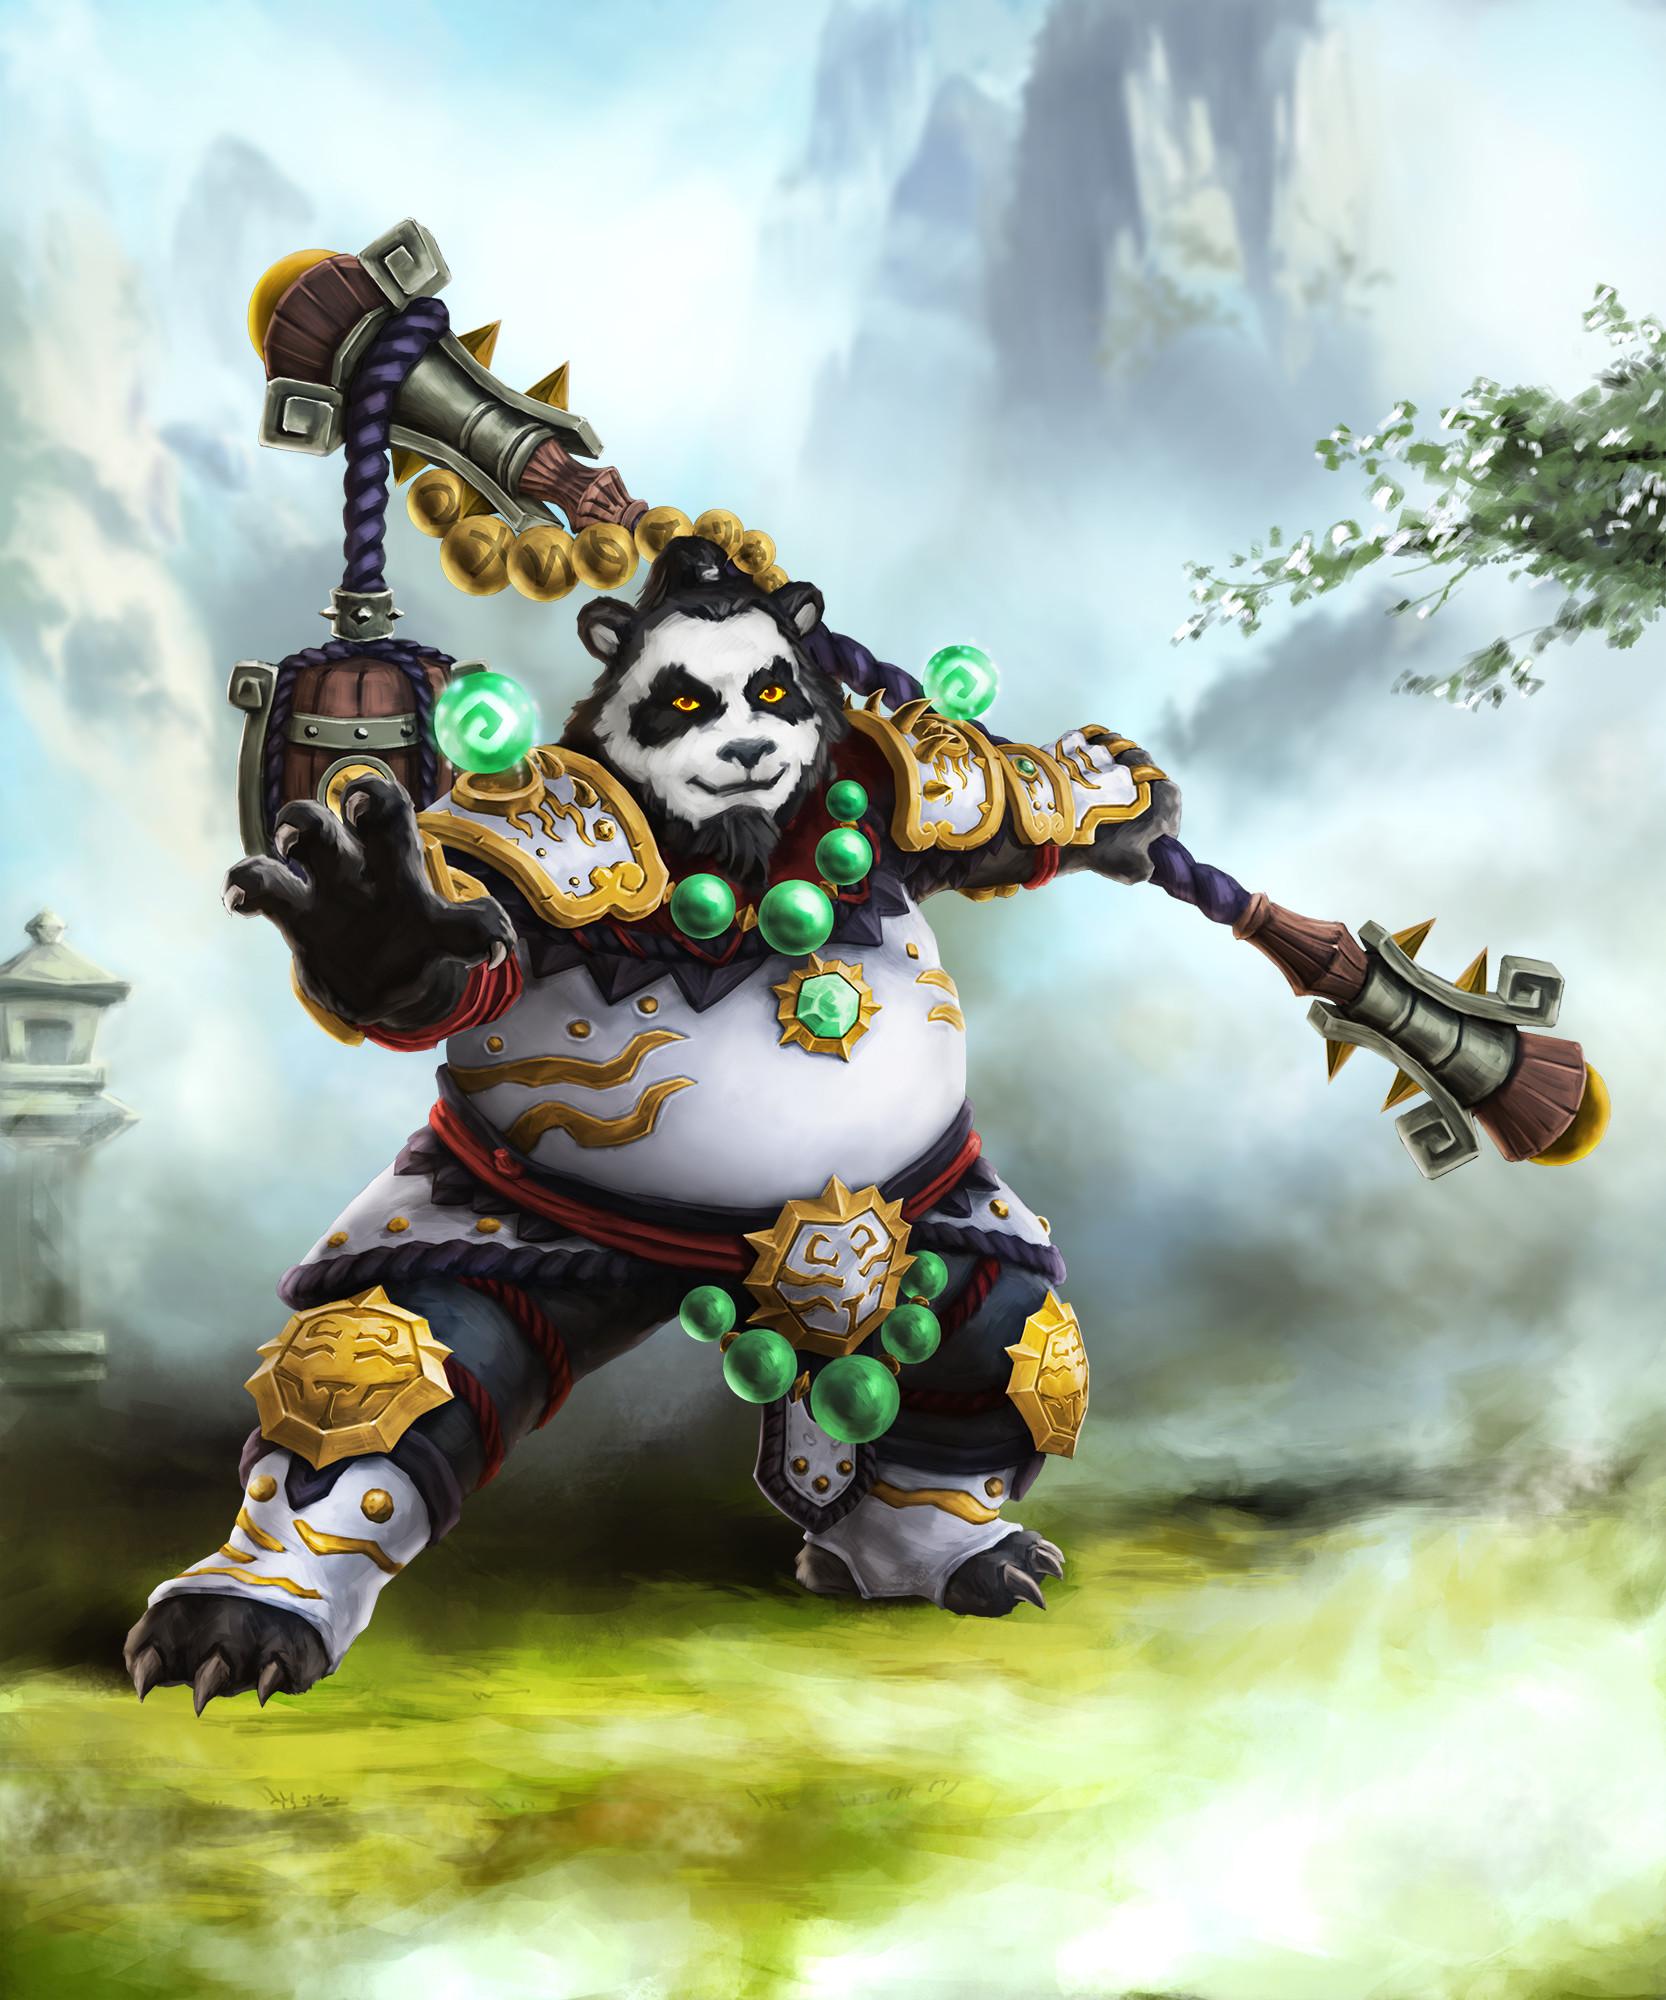 ArtStation - Monk-pandaren, Silent Hsu